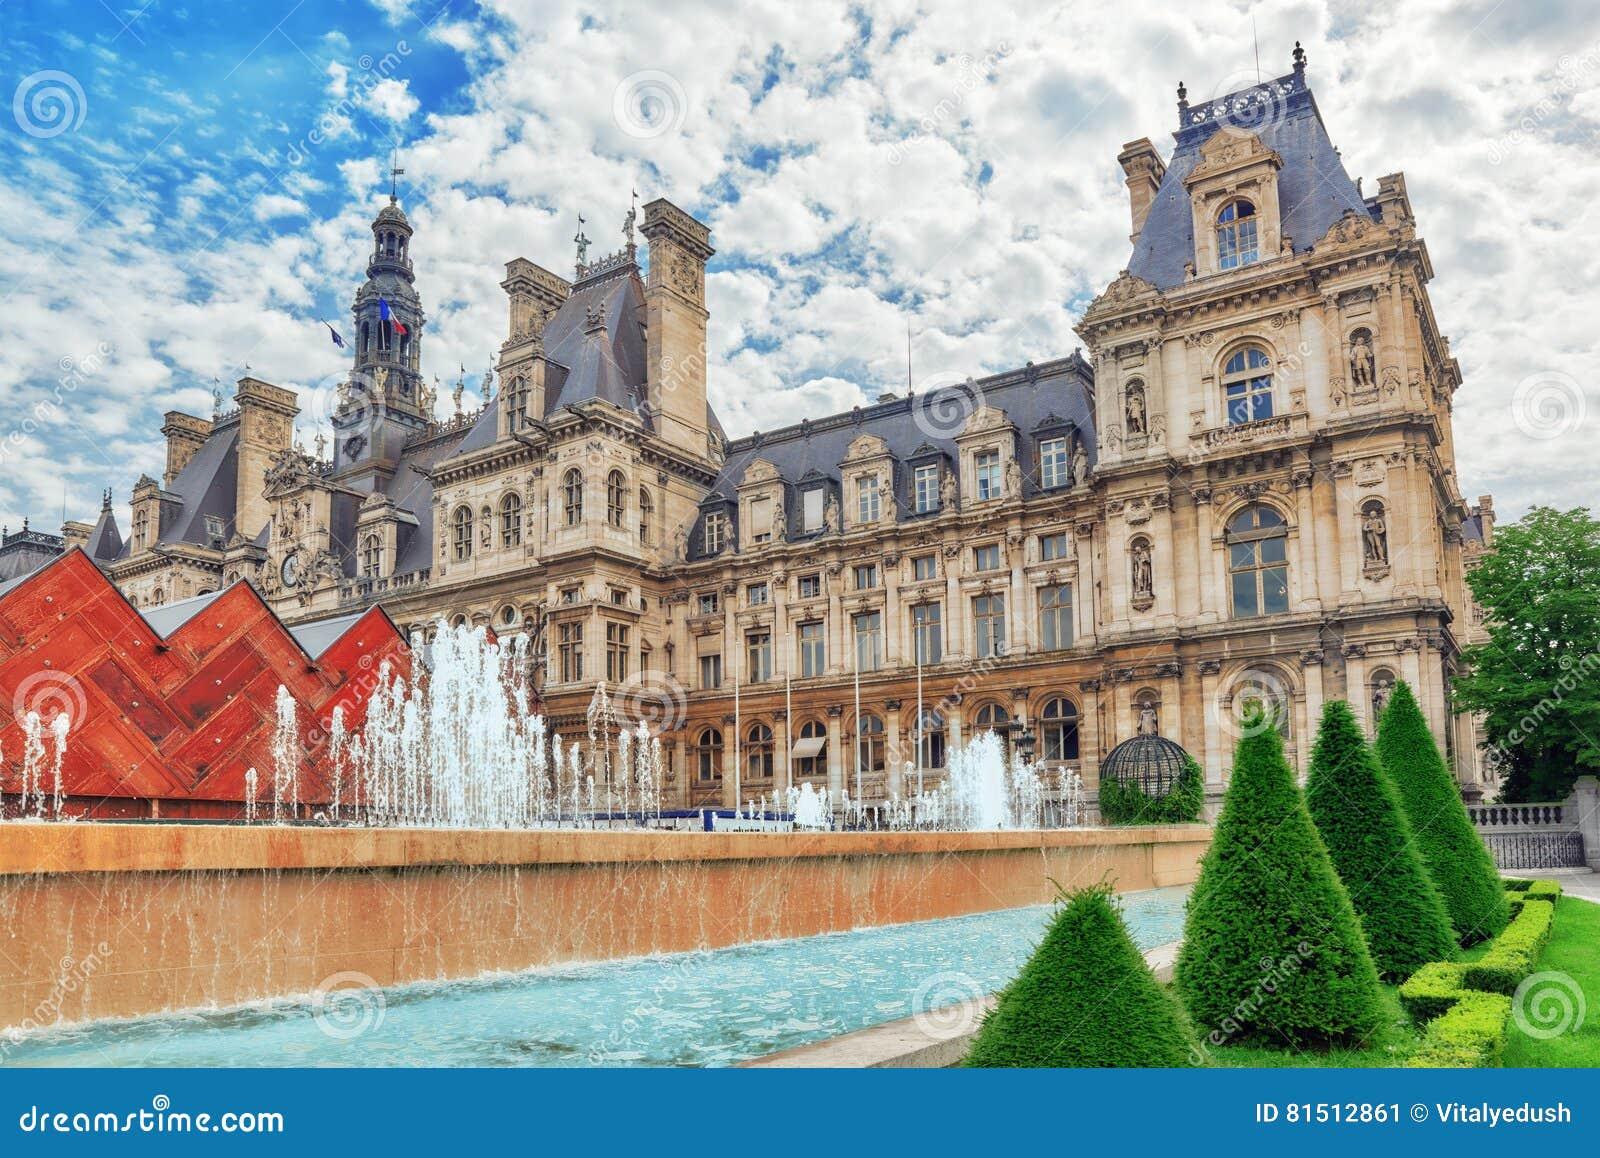 Hotel De Ville In Paris Is The Building Housing City S Local Ad